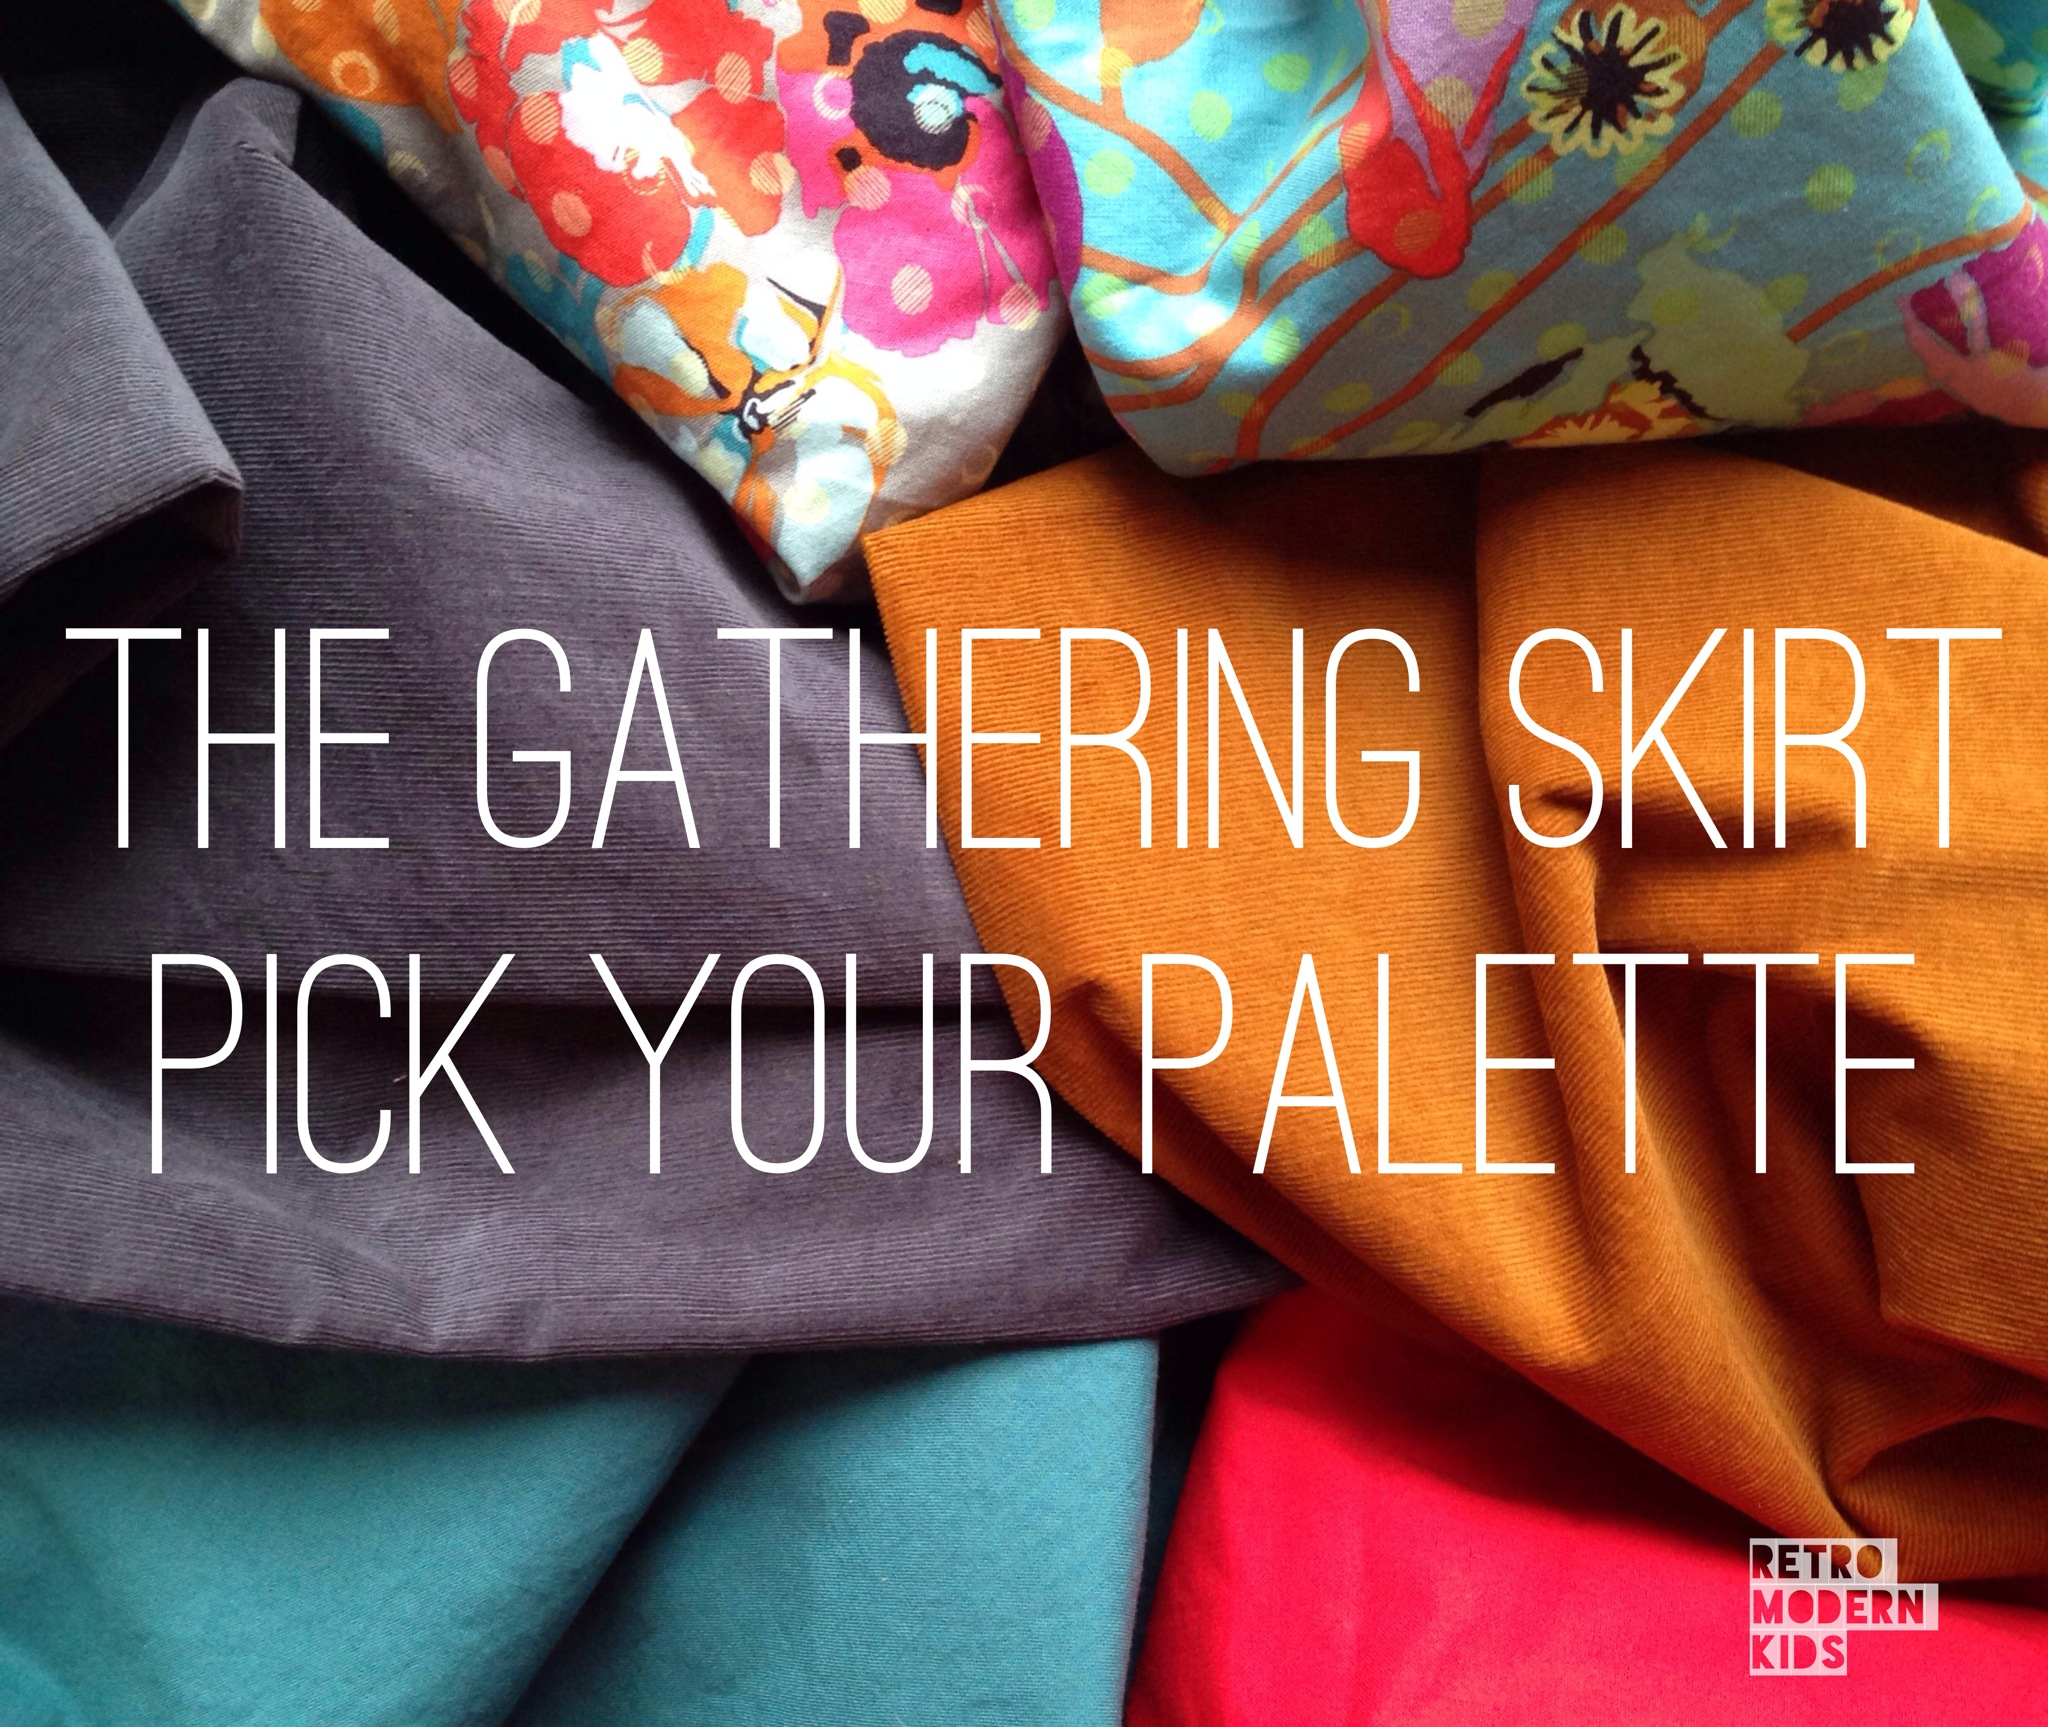 retro modern kids gathering skirt pick your palette corduroy gray camel warm cool anna maria horner raindrops on poppies